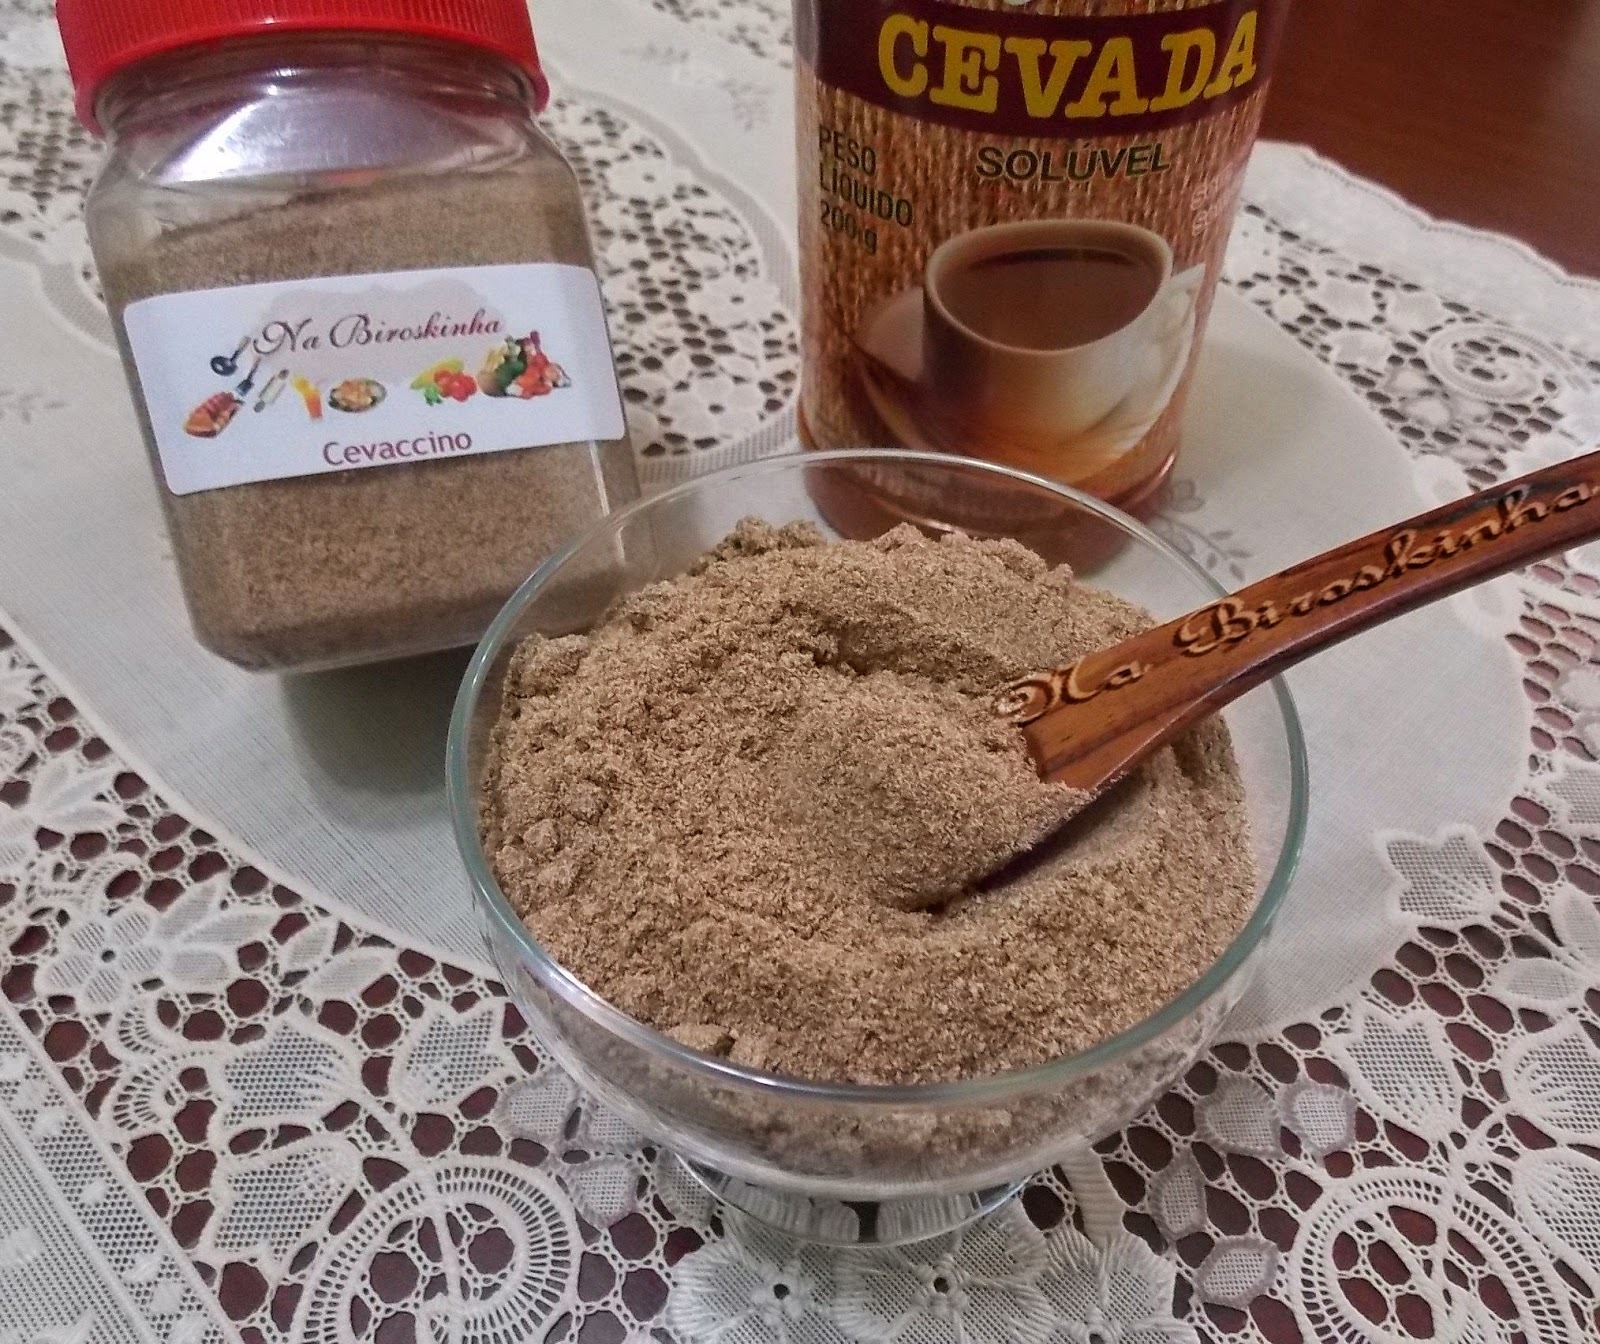 Cevaccino - Capuccino de Cevada